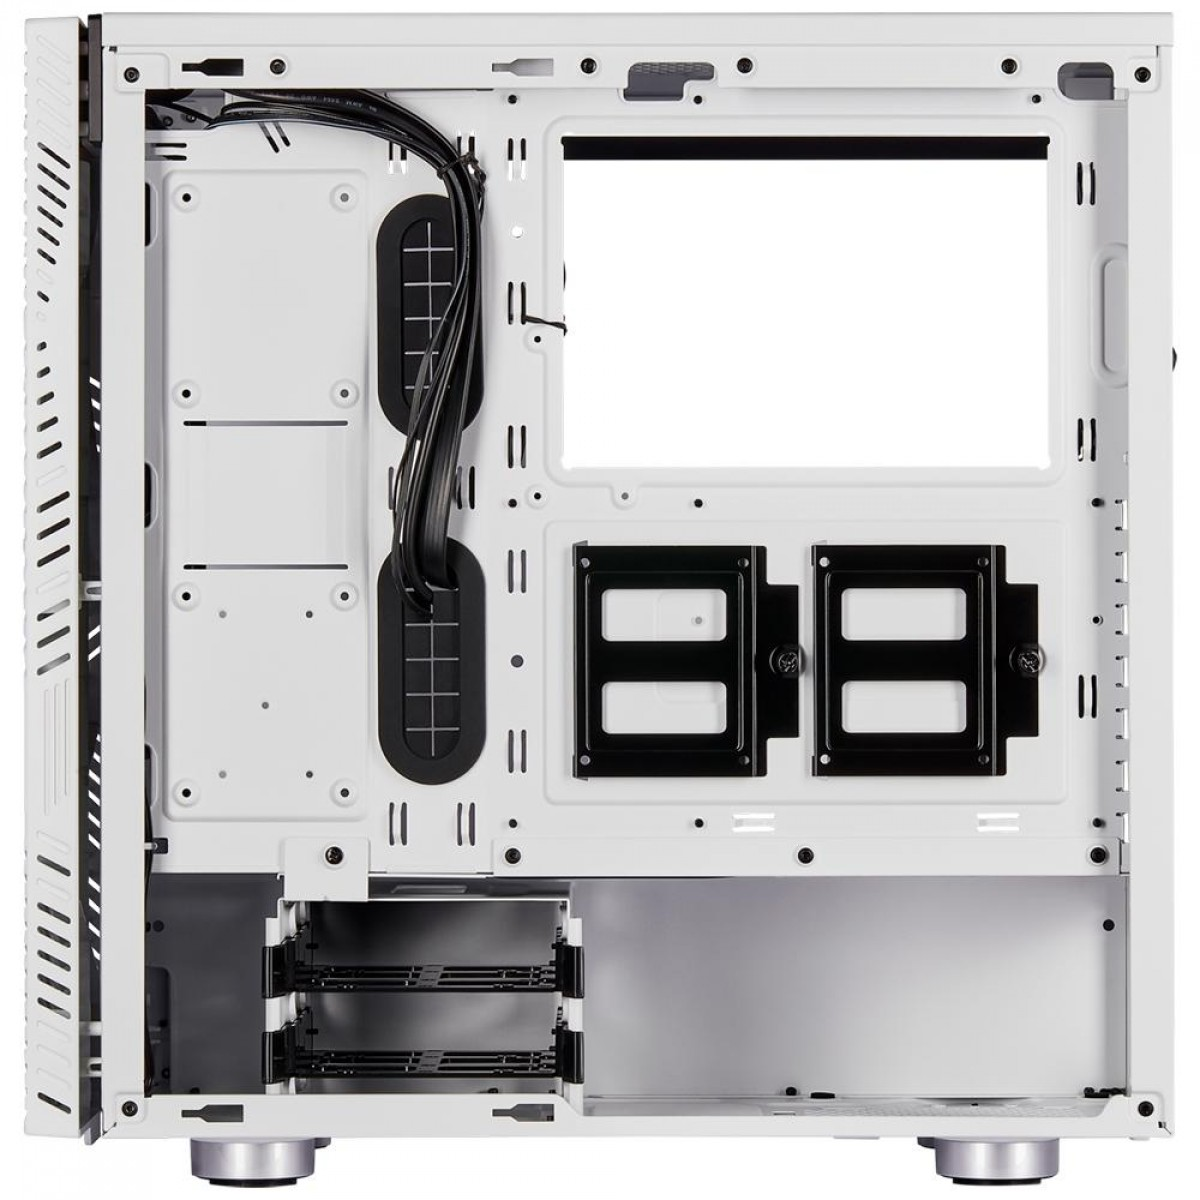 Gabinete Gamer Corsair Carbide 275R Airflow, Mid Tower, Com 3 Fans, Vidro Temperado, White, Sem Fonte CC-9011182-WW